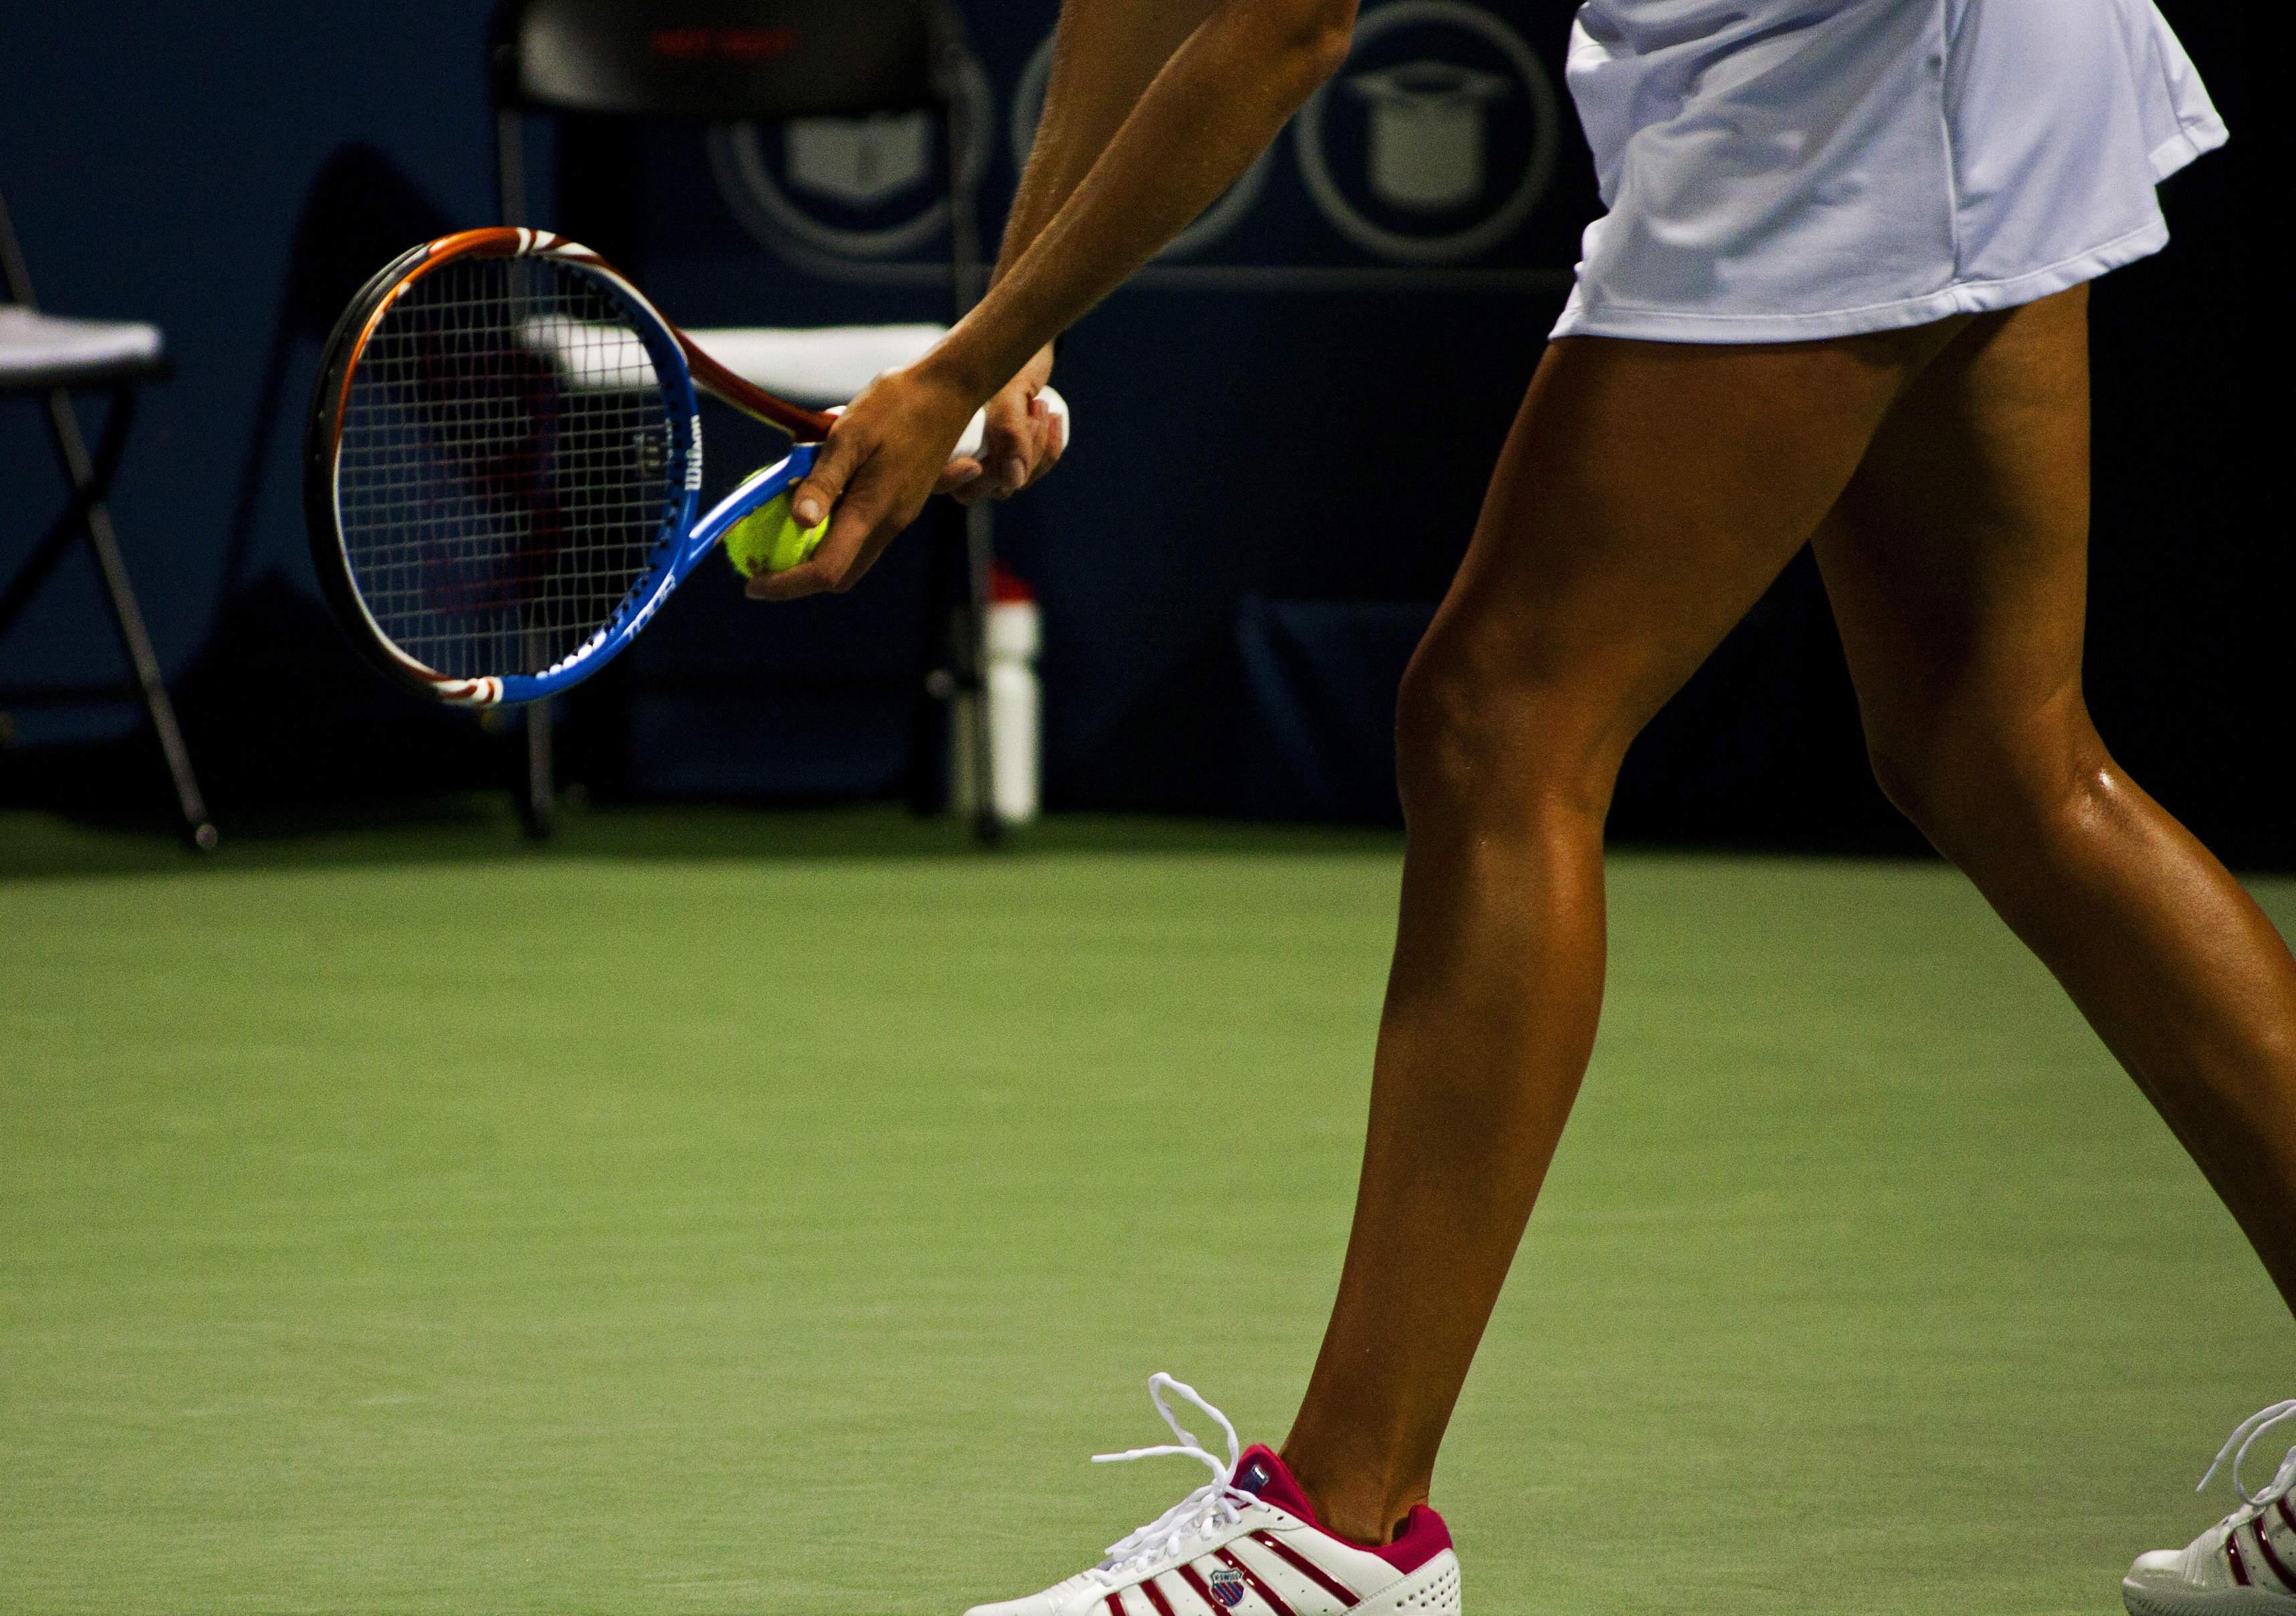 tennis_sports_ball